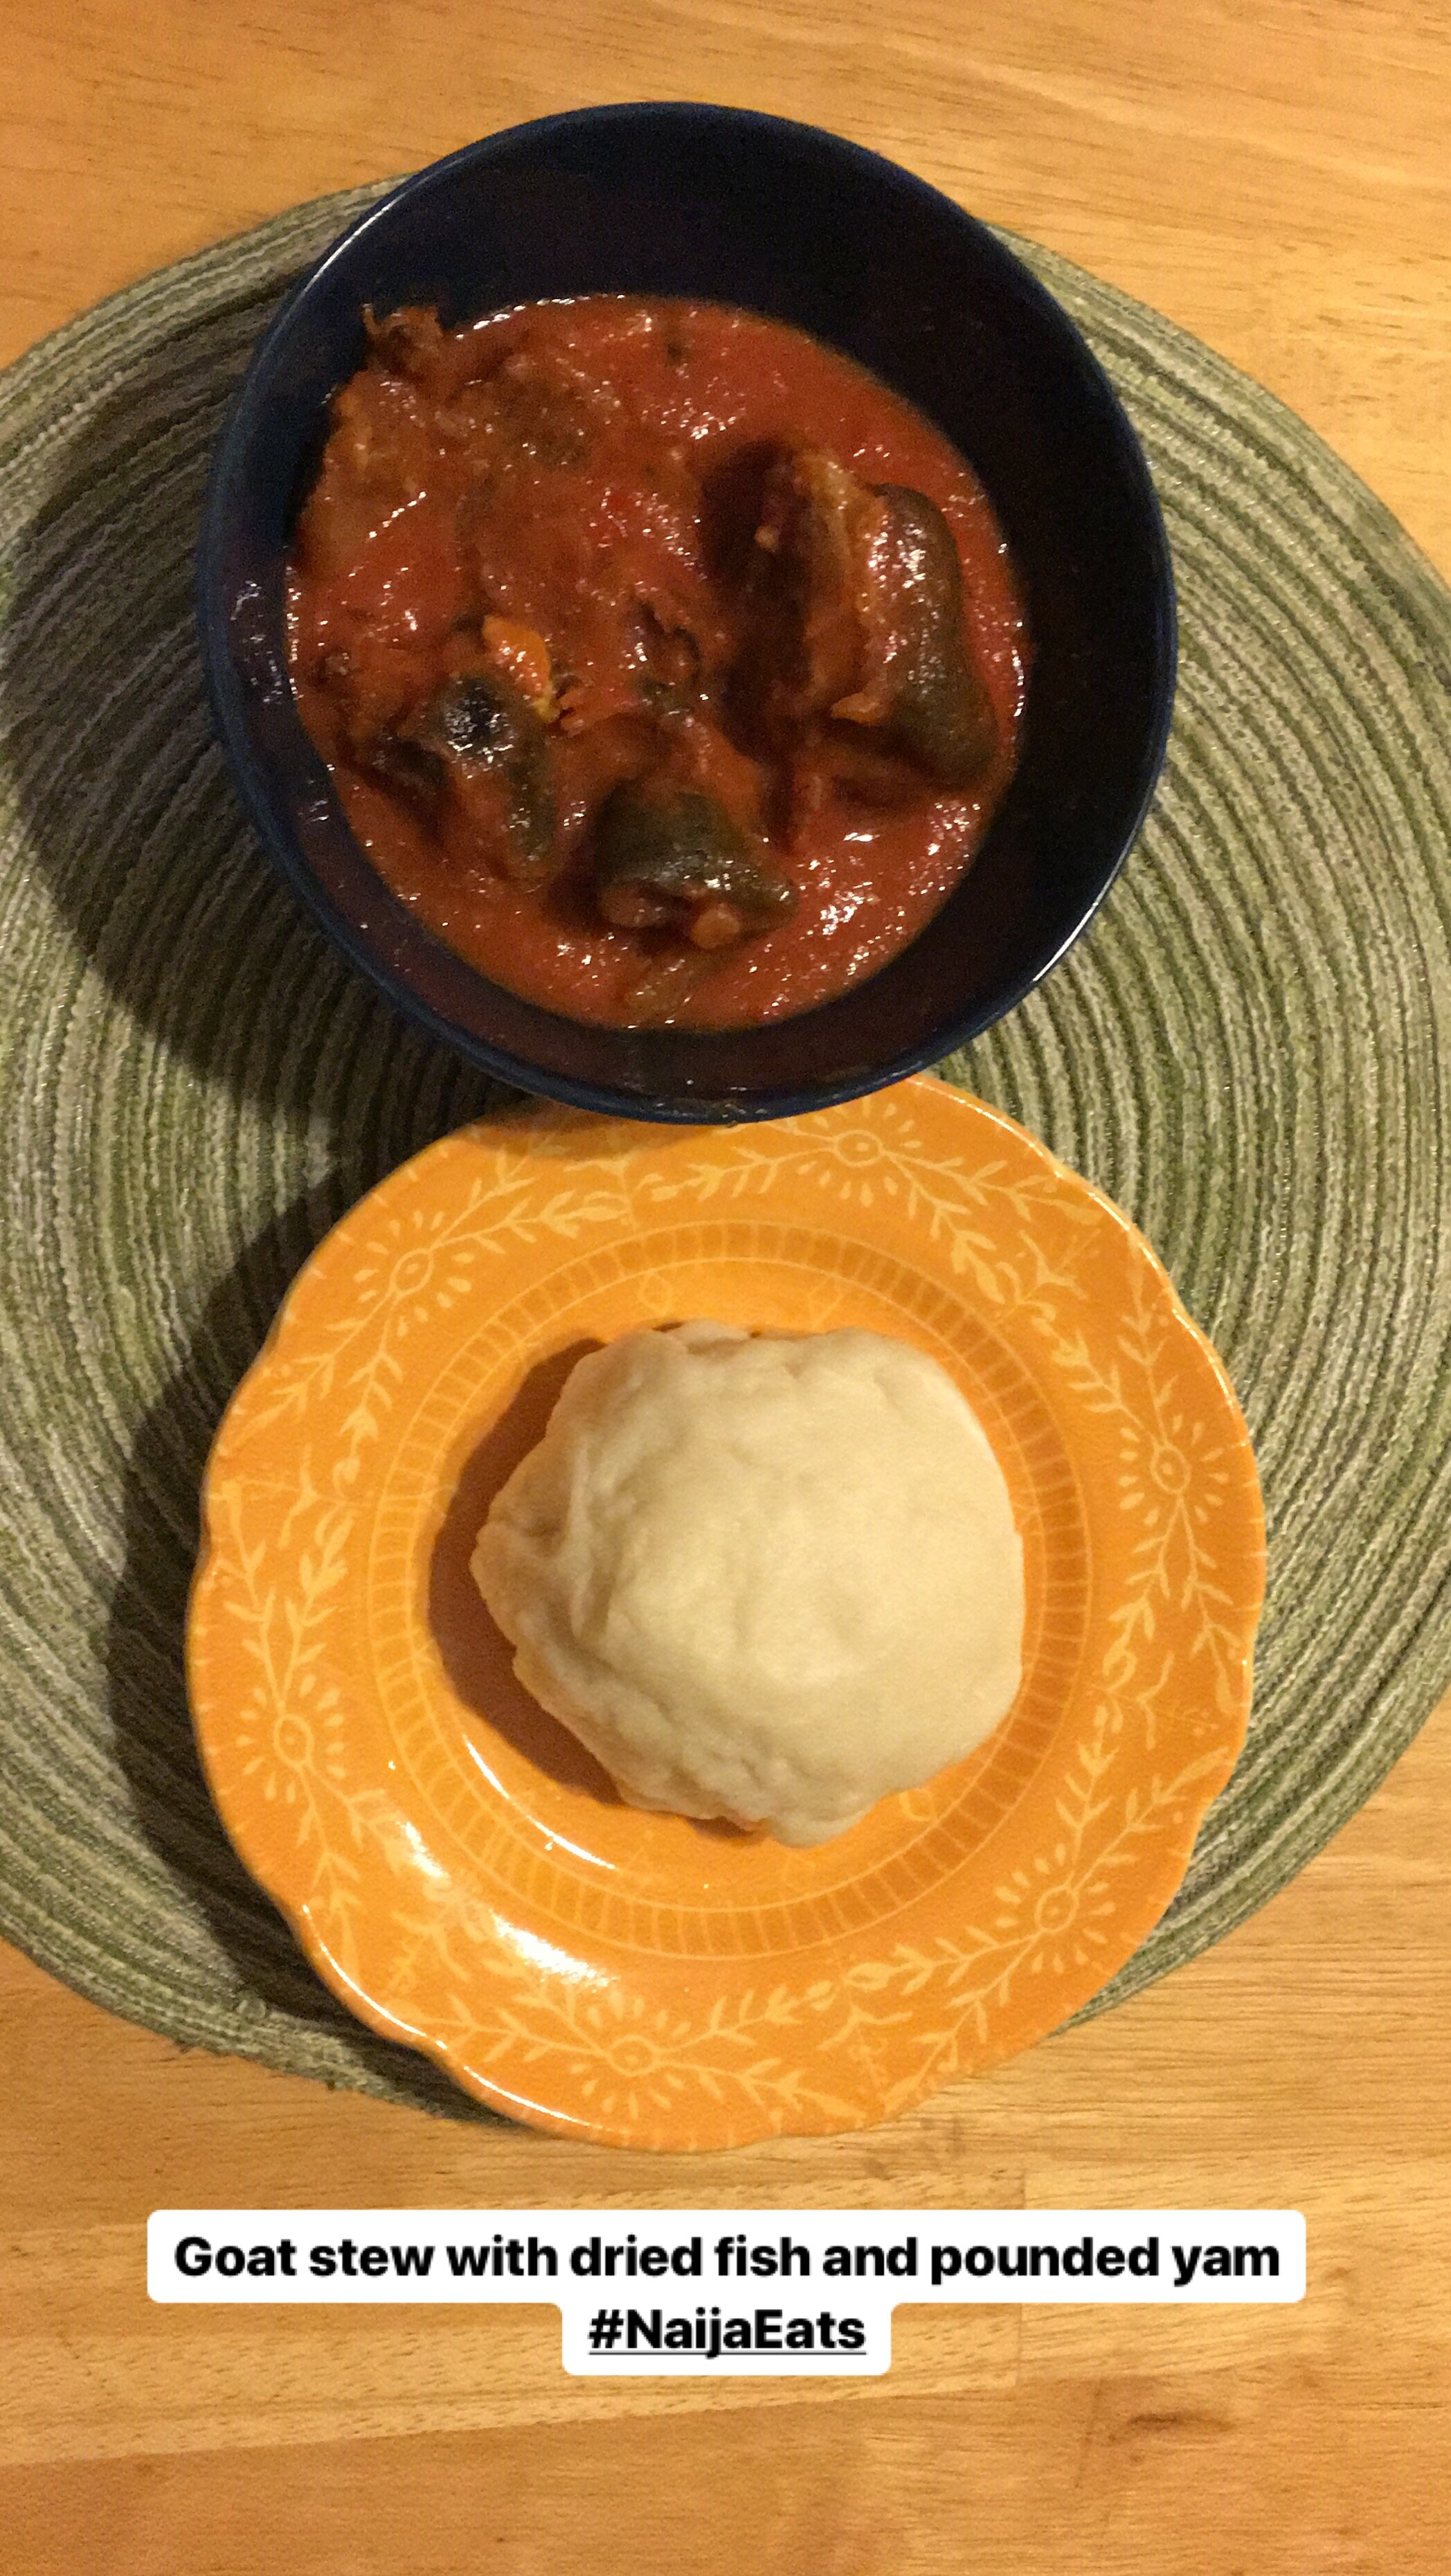 Comment Ranger Ma Cuisine november fablefriday: olubunmi mia olufemi, children's